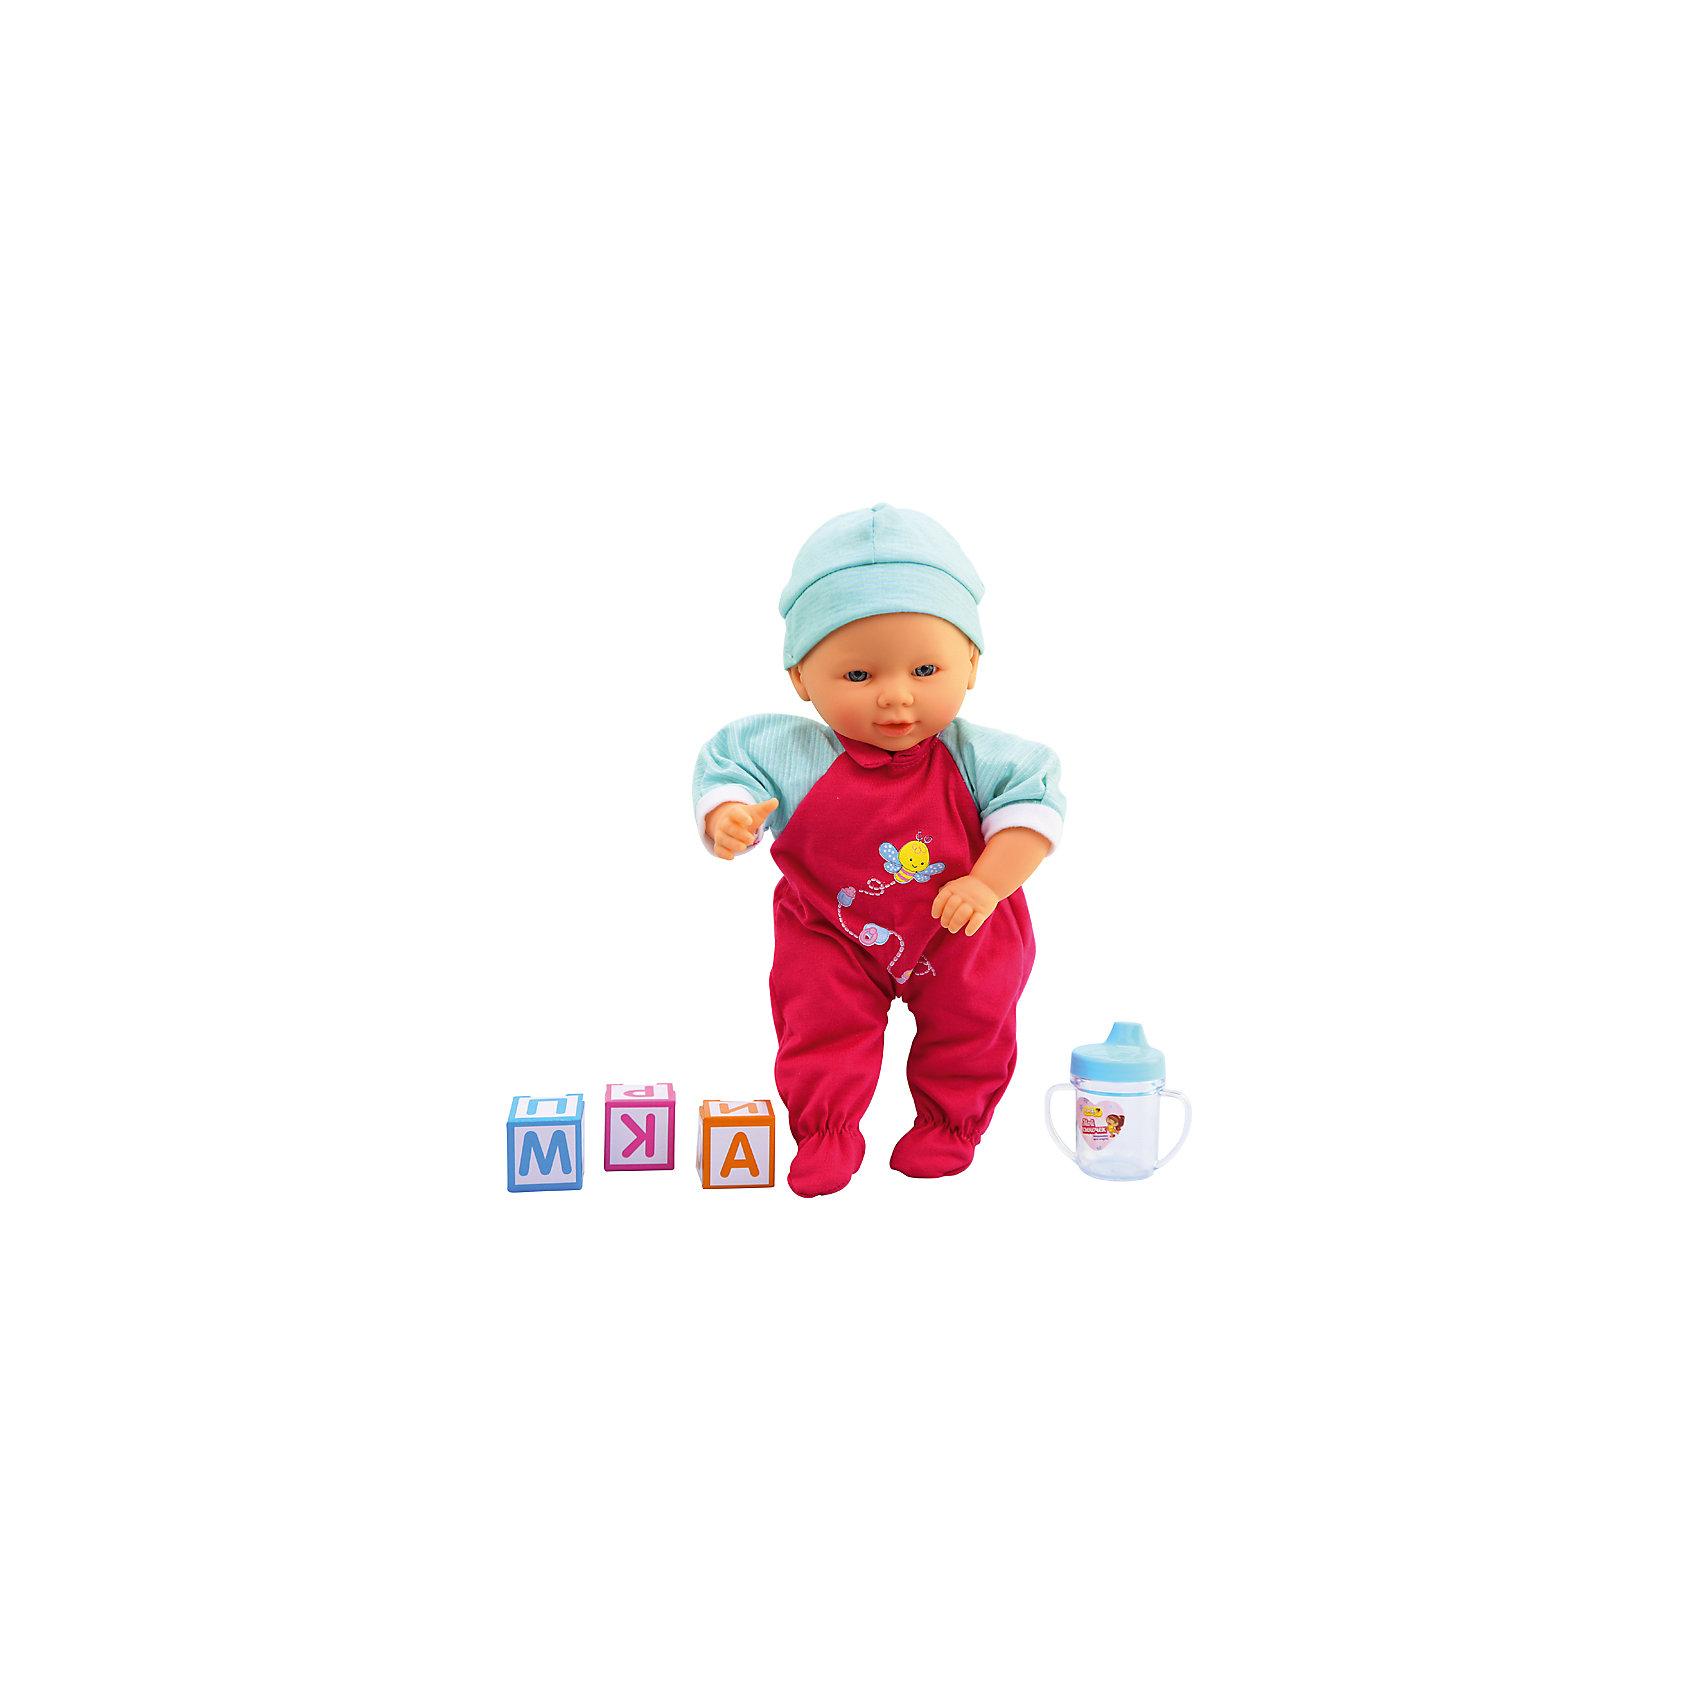 Интерактивная кукла-младенец Мой сыночек, 35,5 см, DollyToyКуклы-пупсы<br><br><br>Ширина мм: 260<br>Глубина мм: 135<br>Высота мм: 370<br>Вес г: 800<br>Возраст от месяцев: 36<br>Возраст до месяцев: 72<br>Пол: Женский<br>Возраст: Детский<br>SKU: 5581283